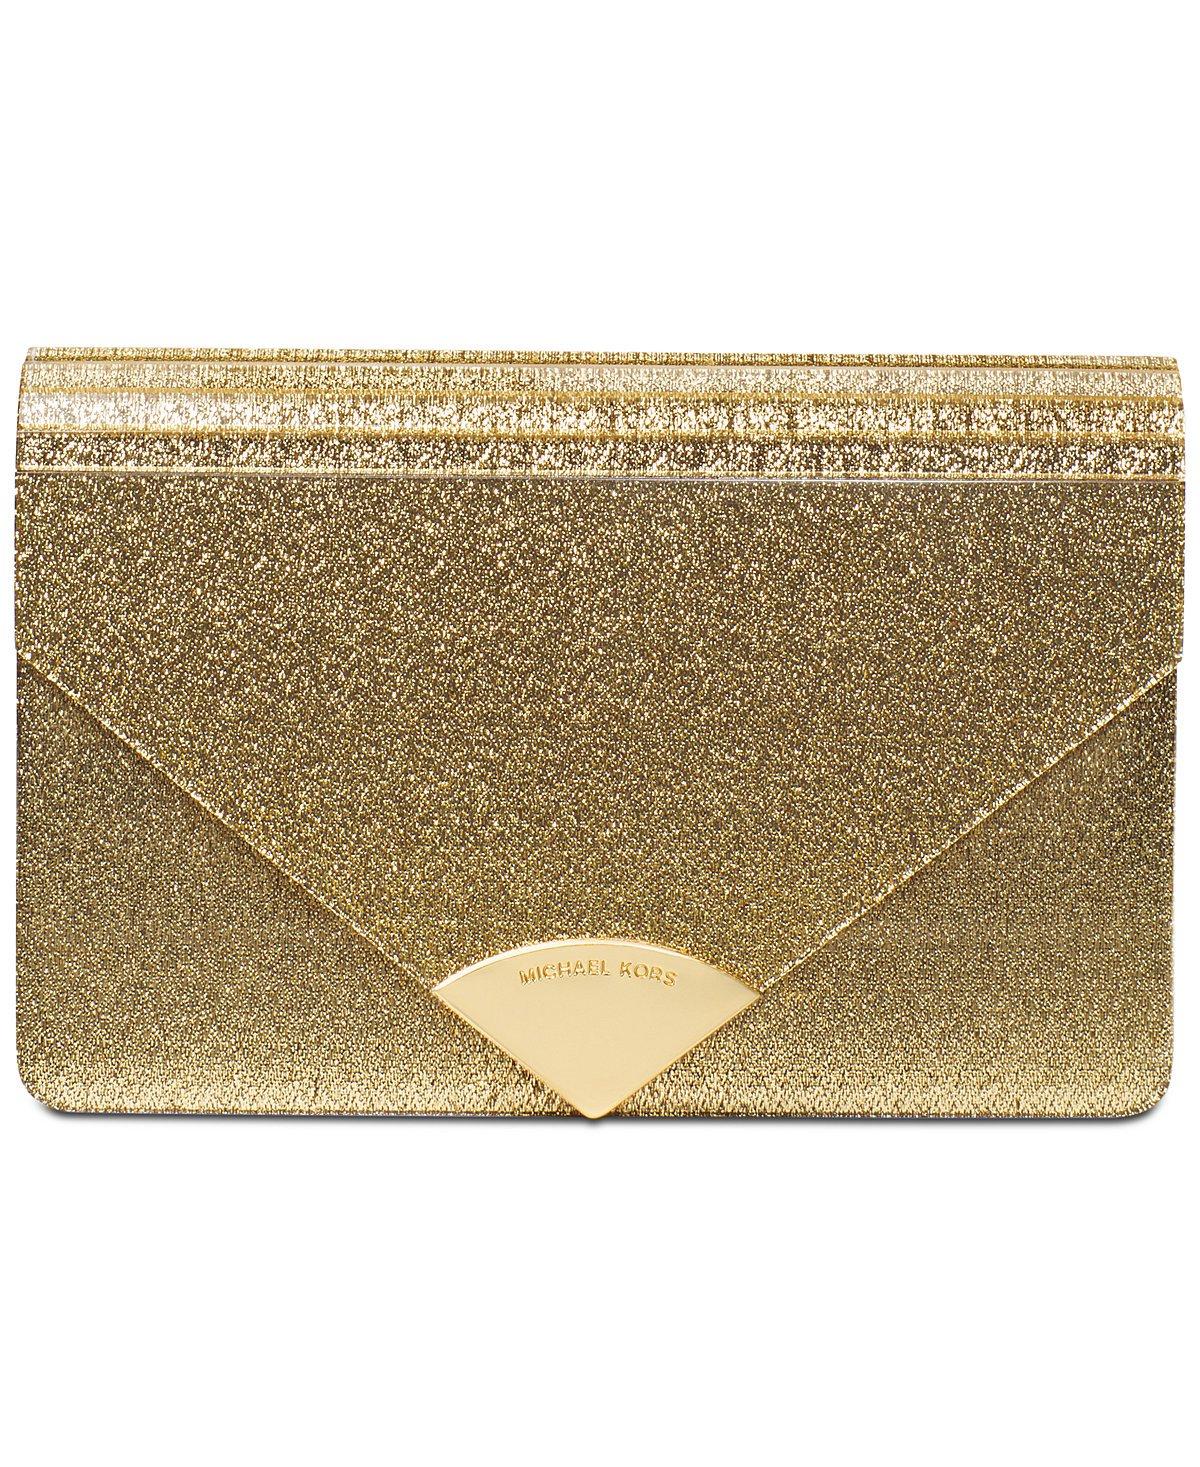 MICHAEL Michael Kors Women's Barbara Metallic Envelope Clutch, Gold, One Size